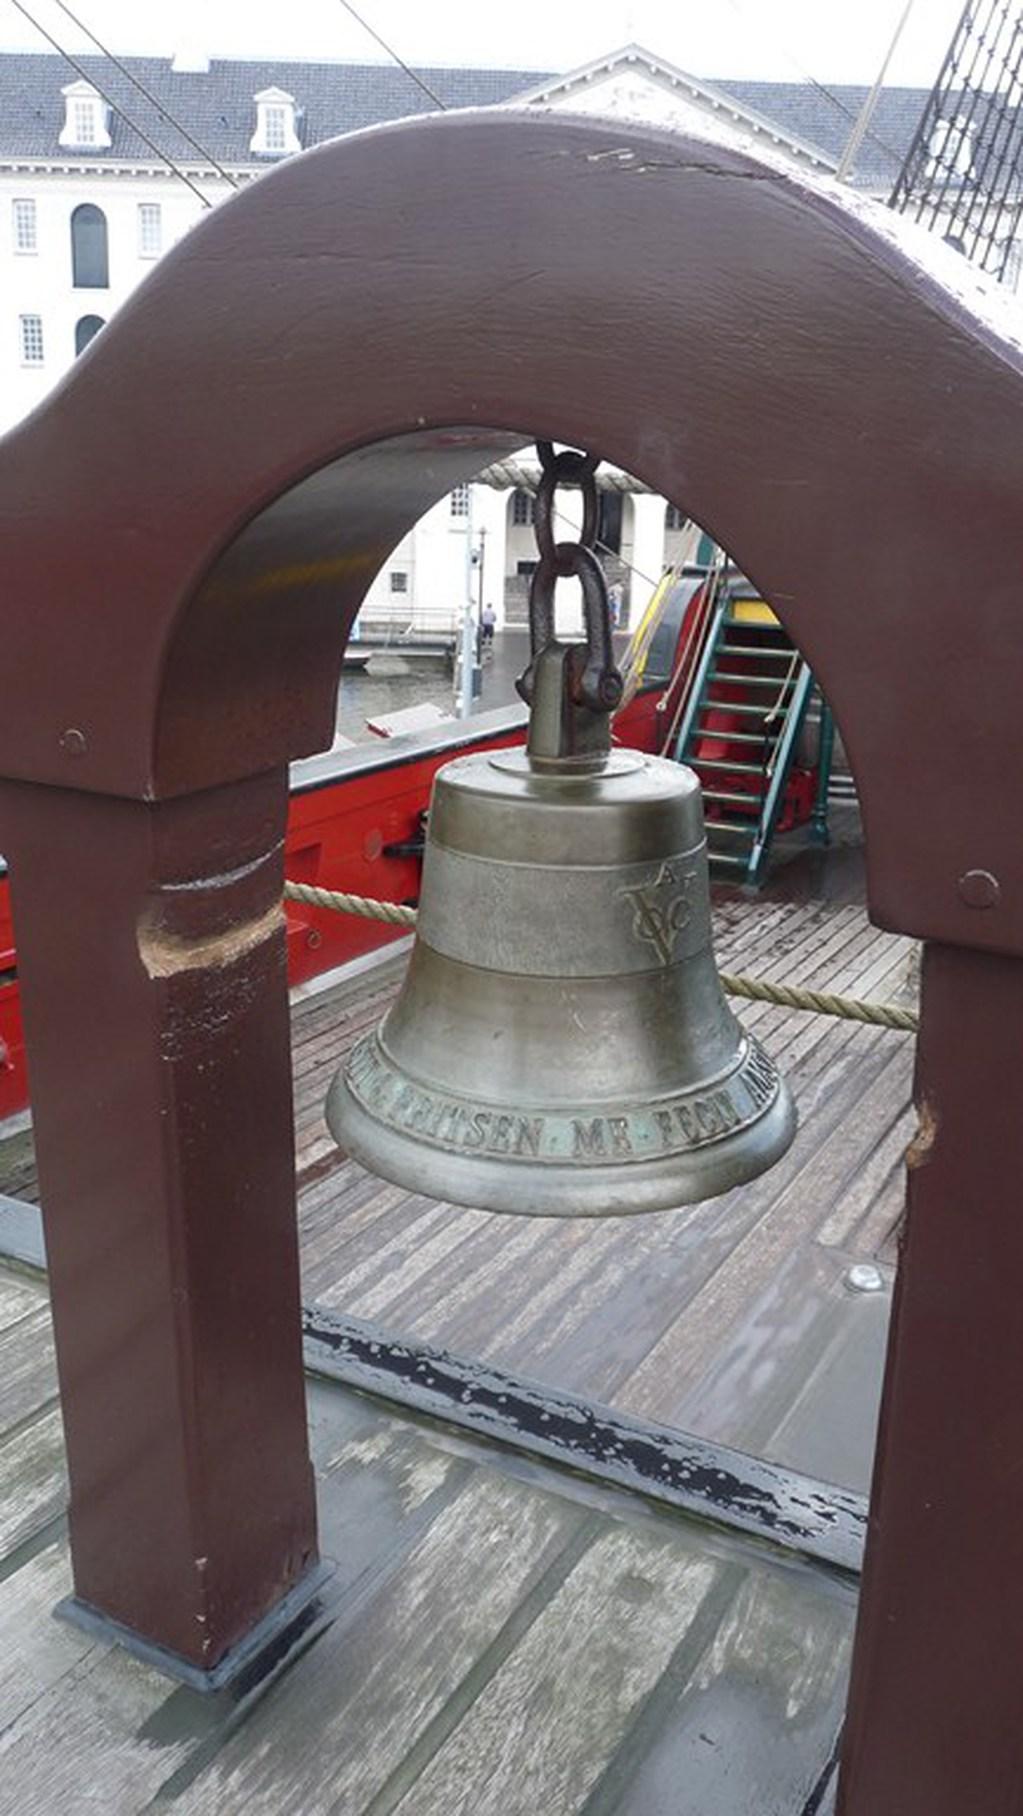 Visite du VOC « AMSTERDAM » (1749) à Amsterdam 17072807404923134915176626